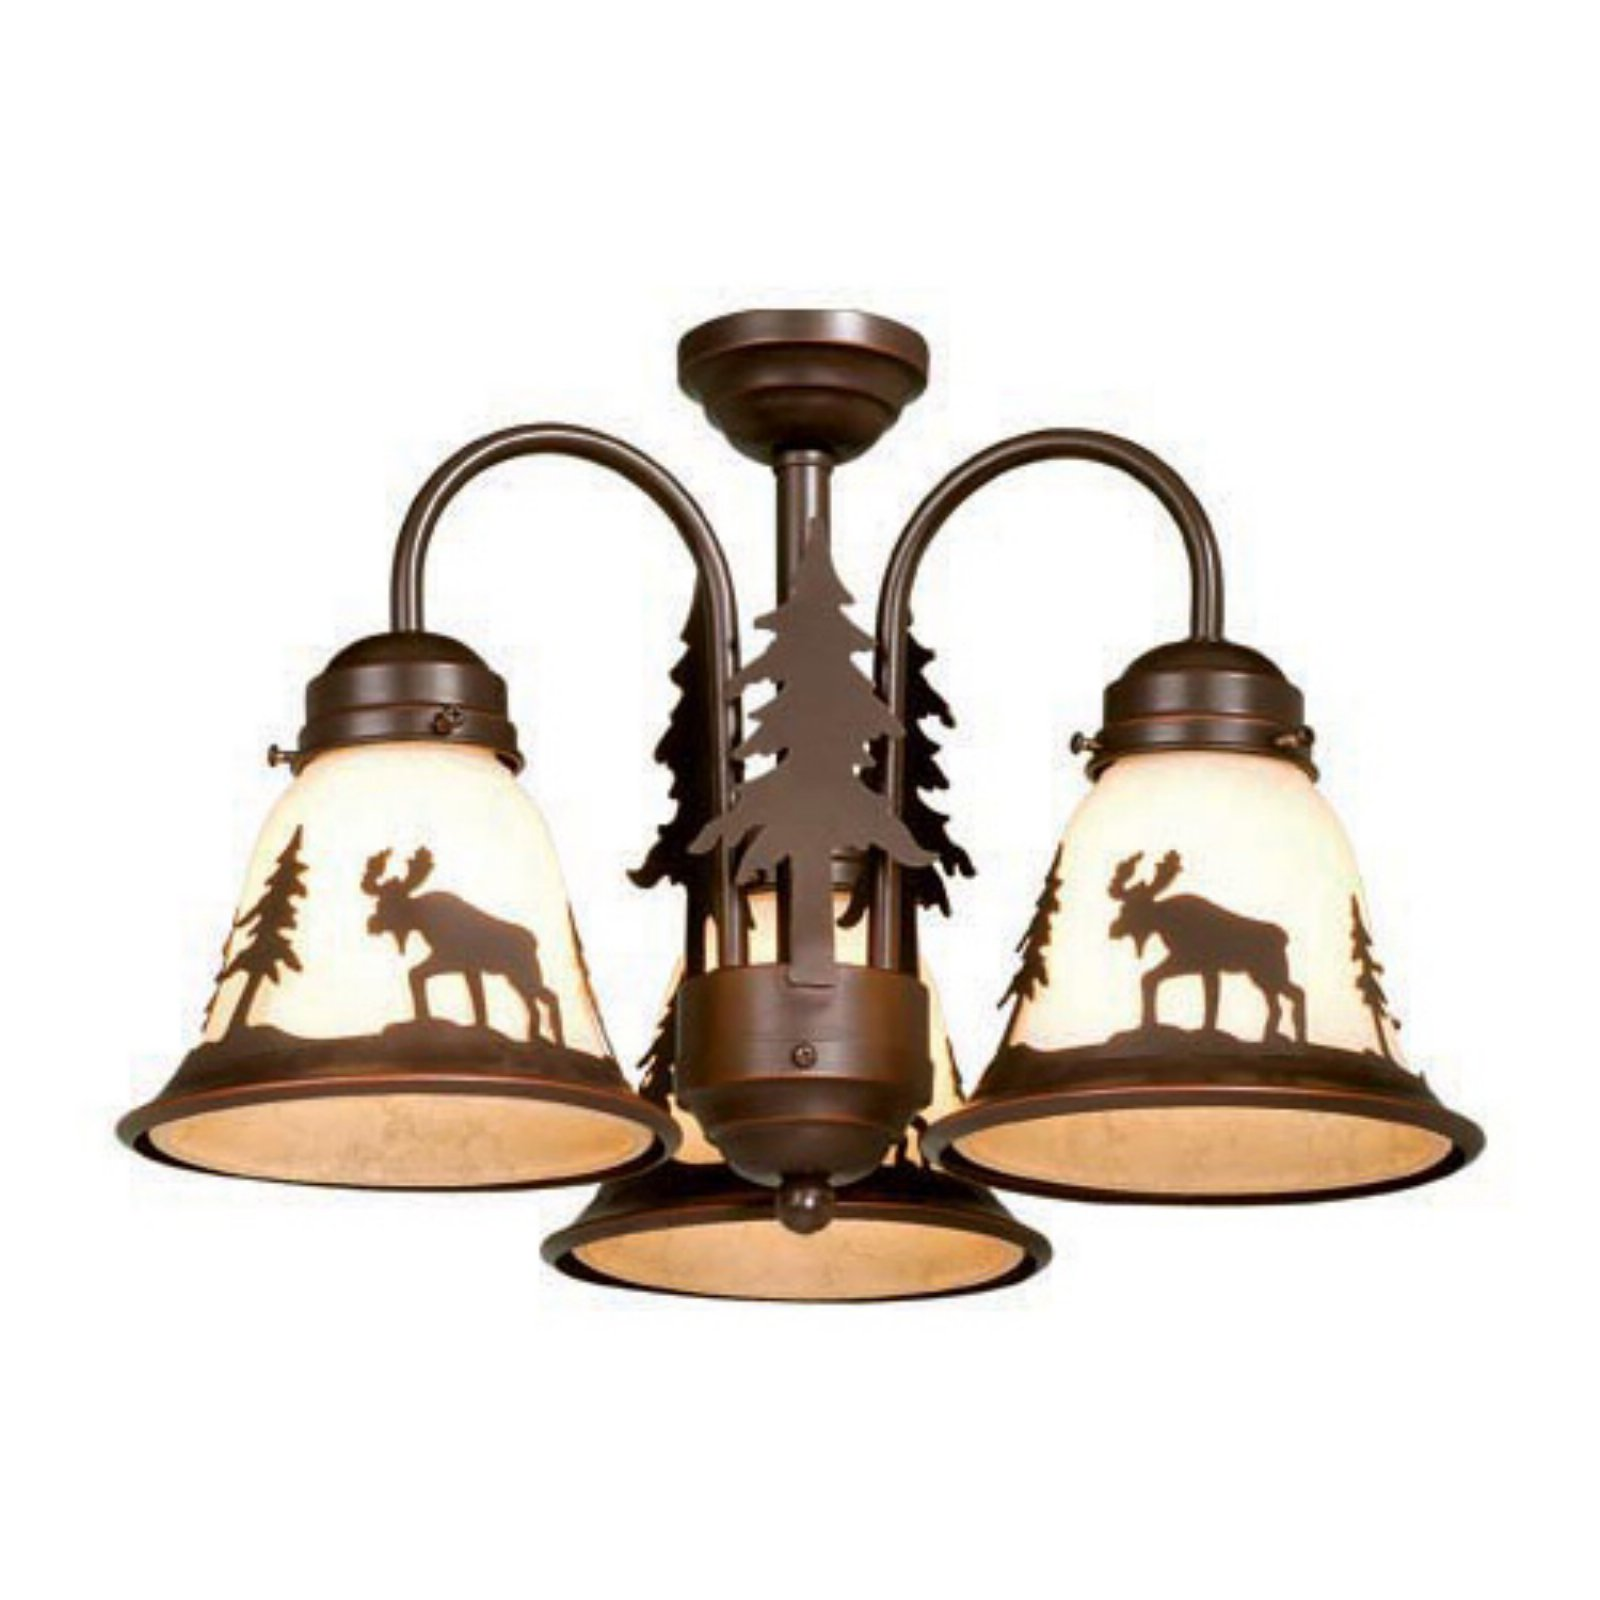 Image of AireRyder LK55616BBZ-C Yellowstone Light Kit - Burnished Bronze